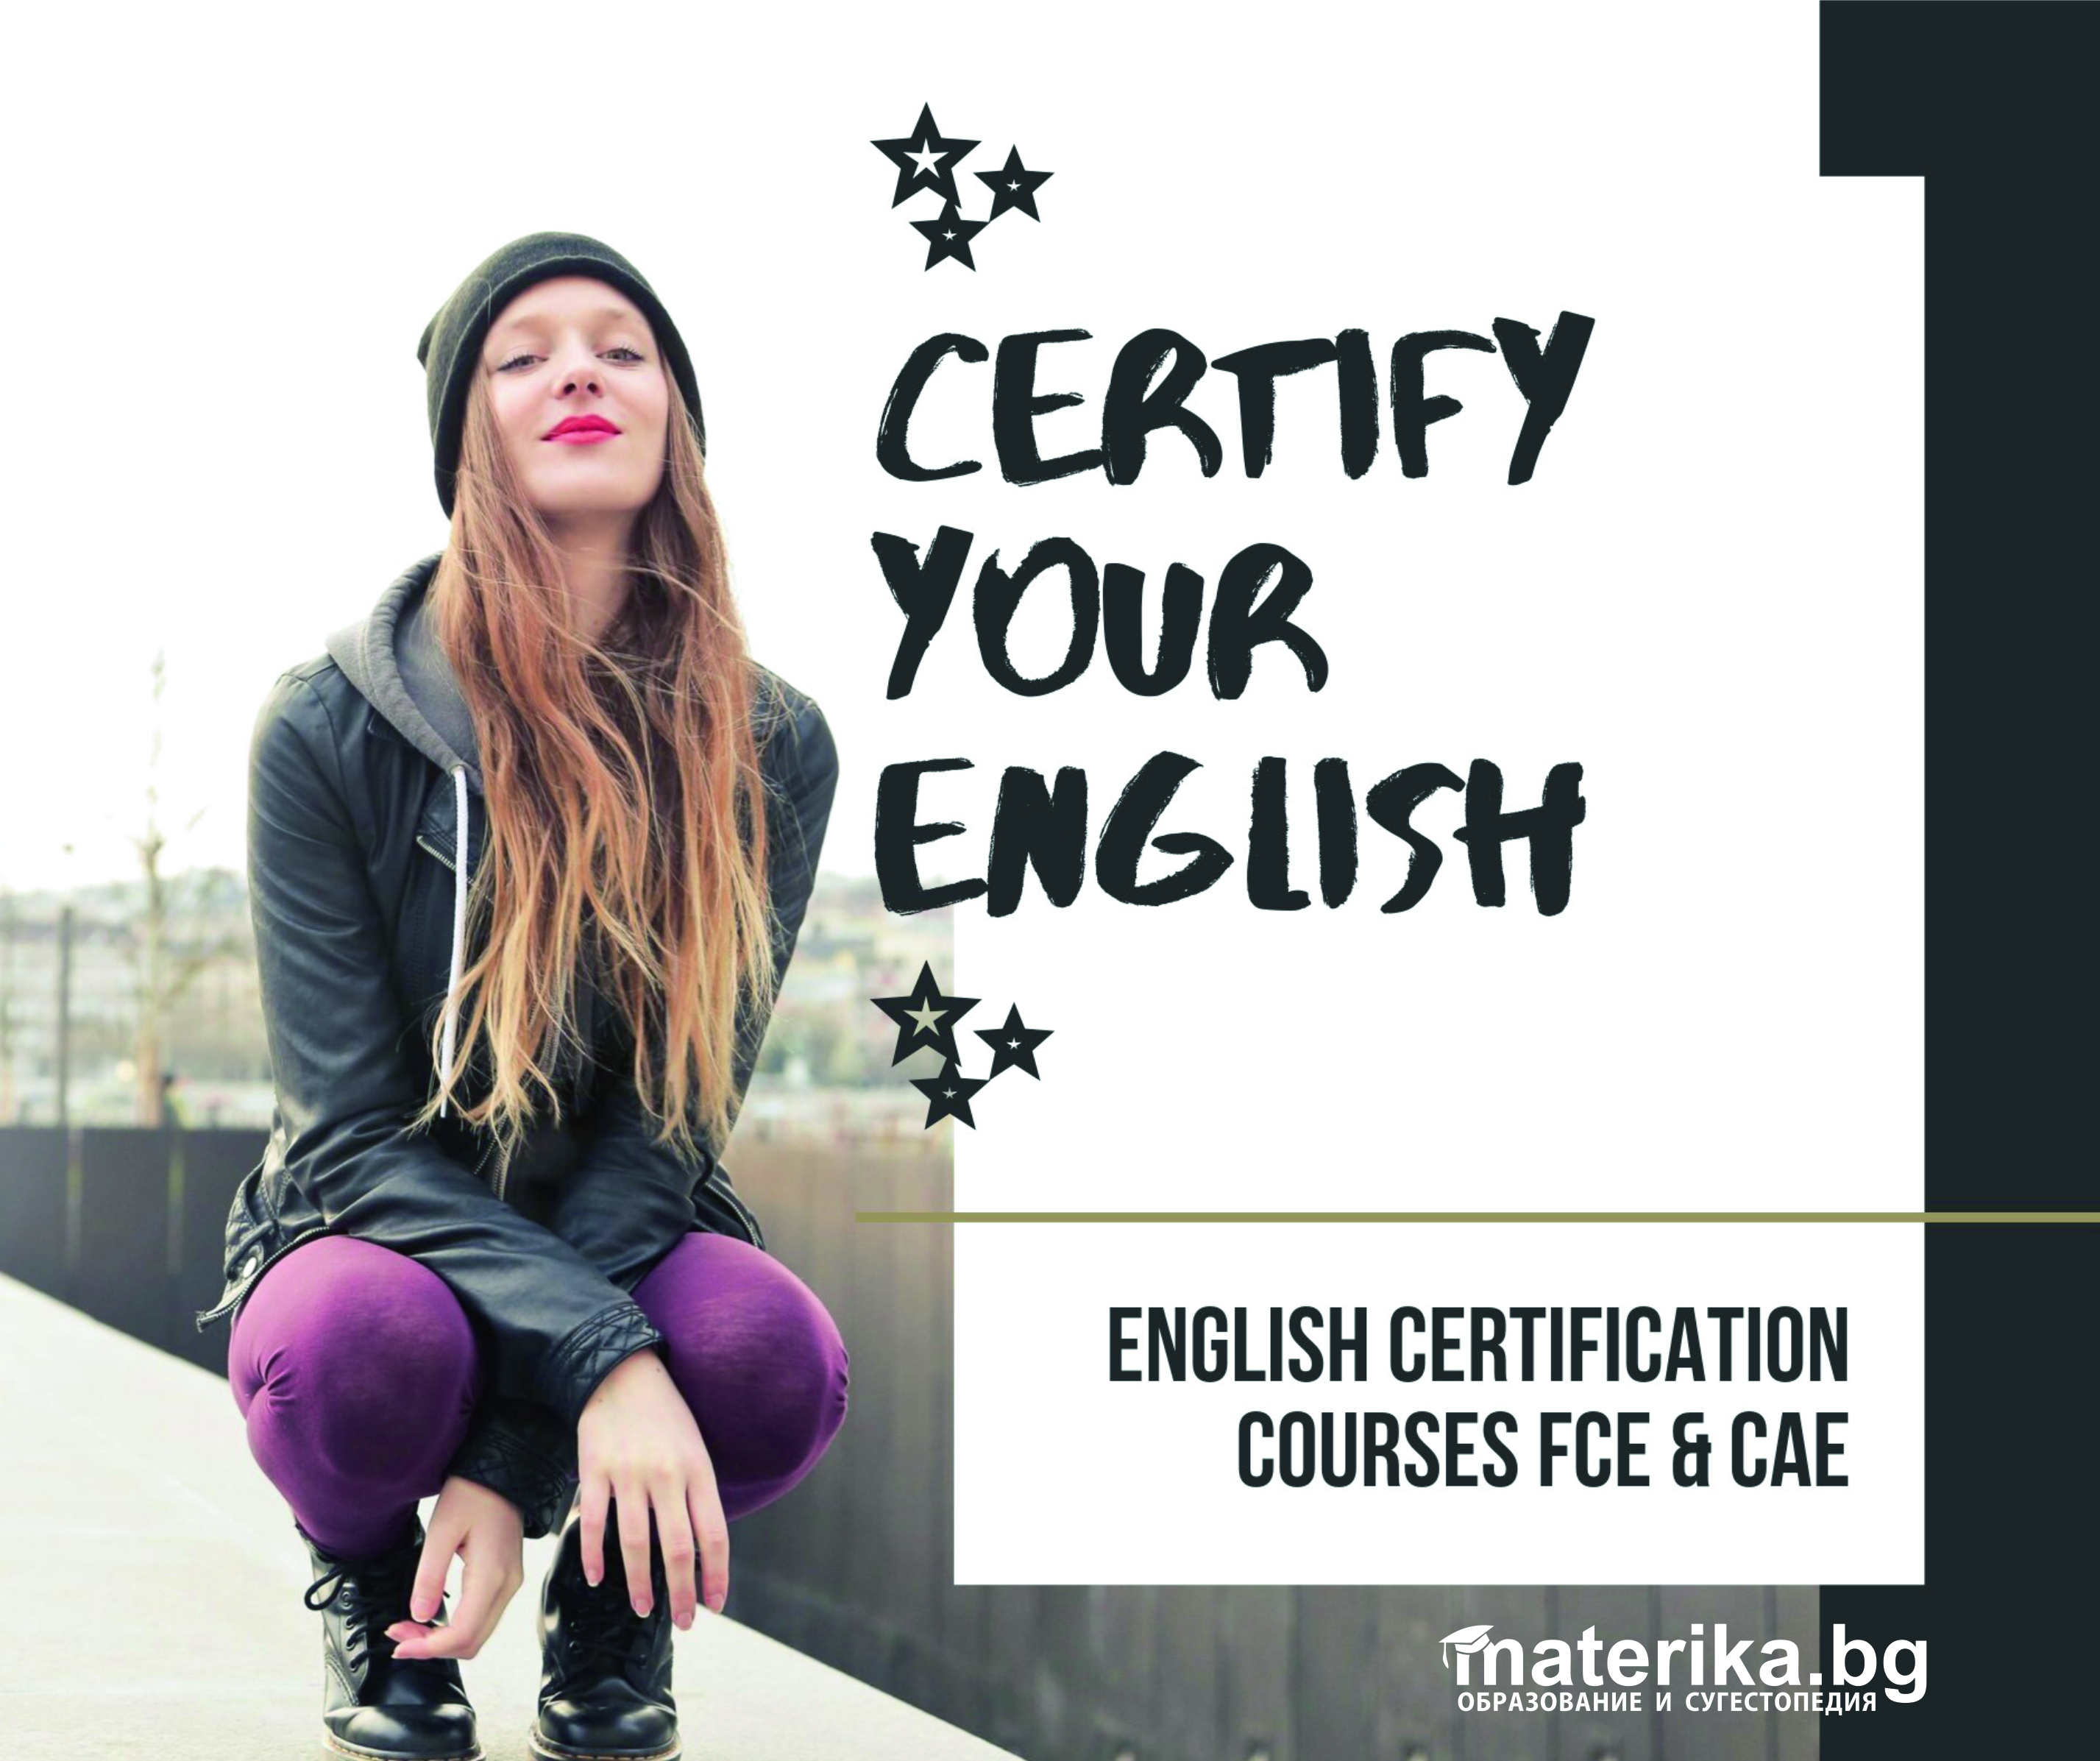 Сeртификатни курсове FCE, CAE, IELTS, TOEFL